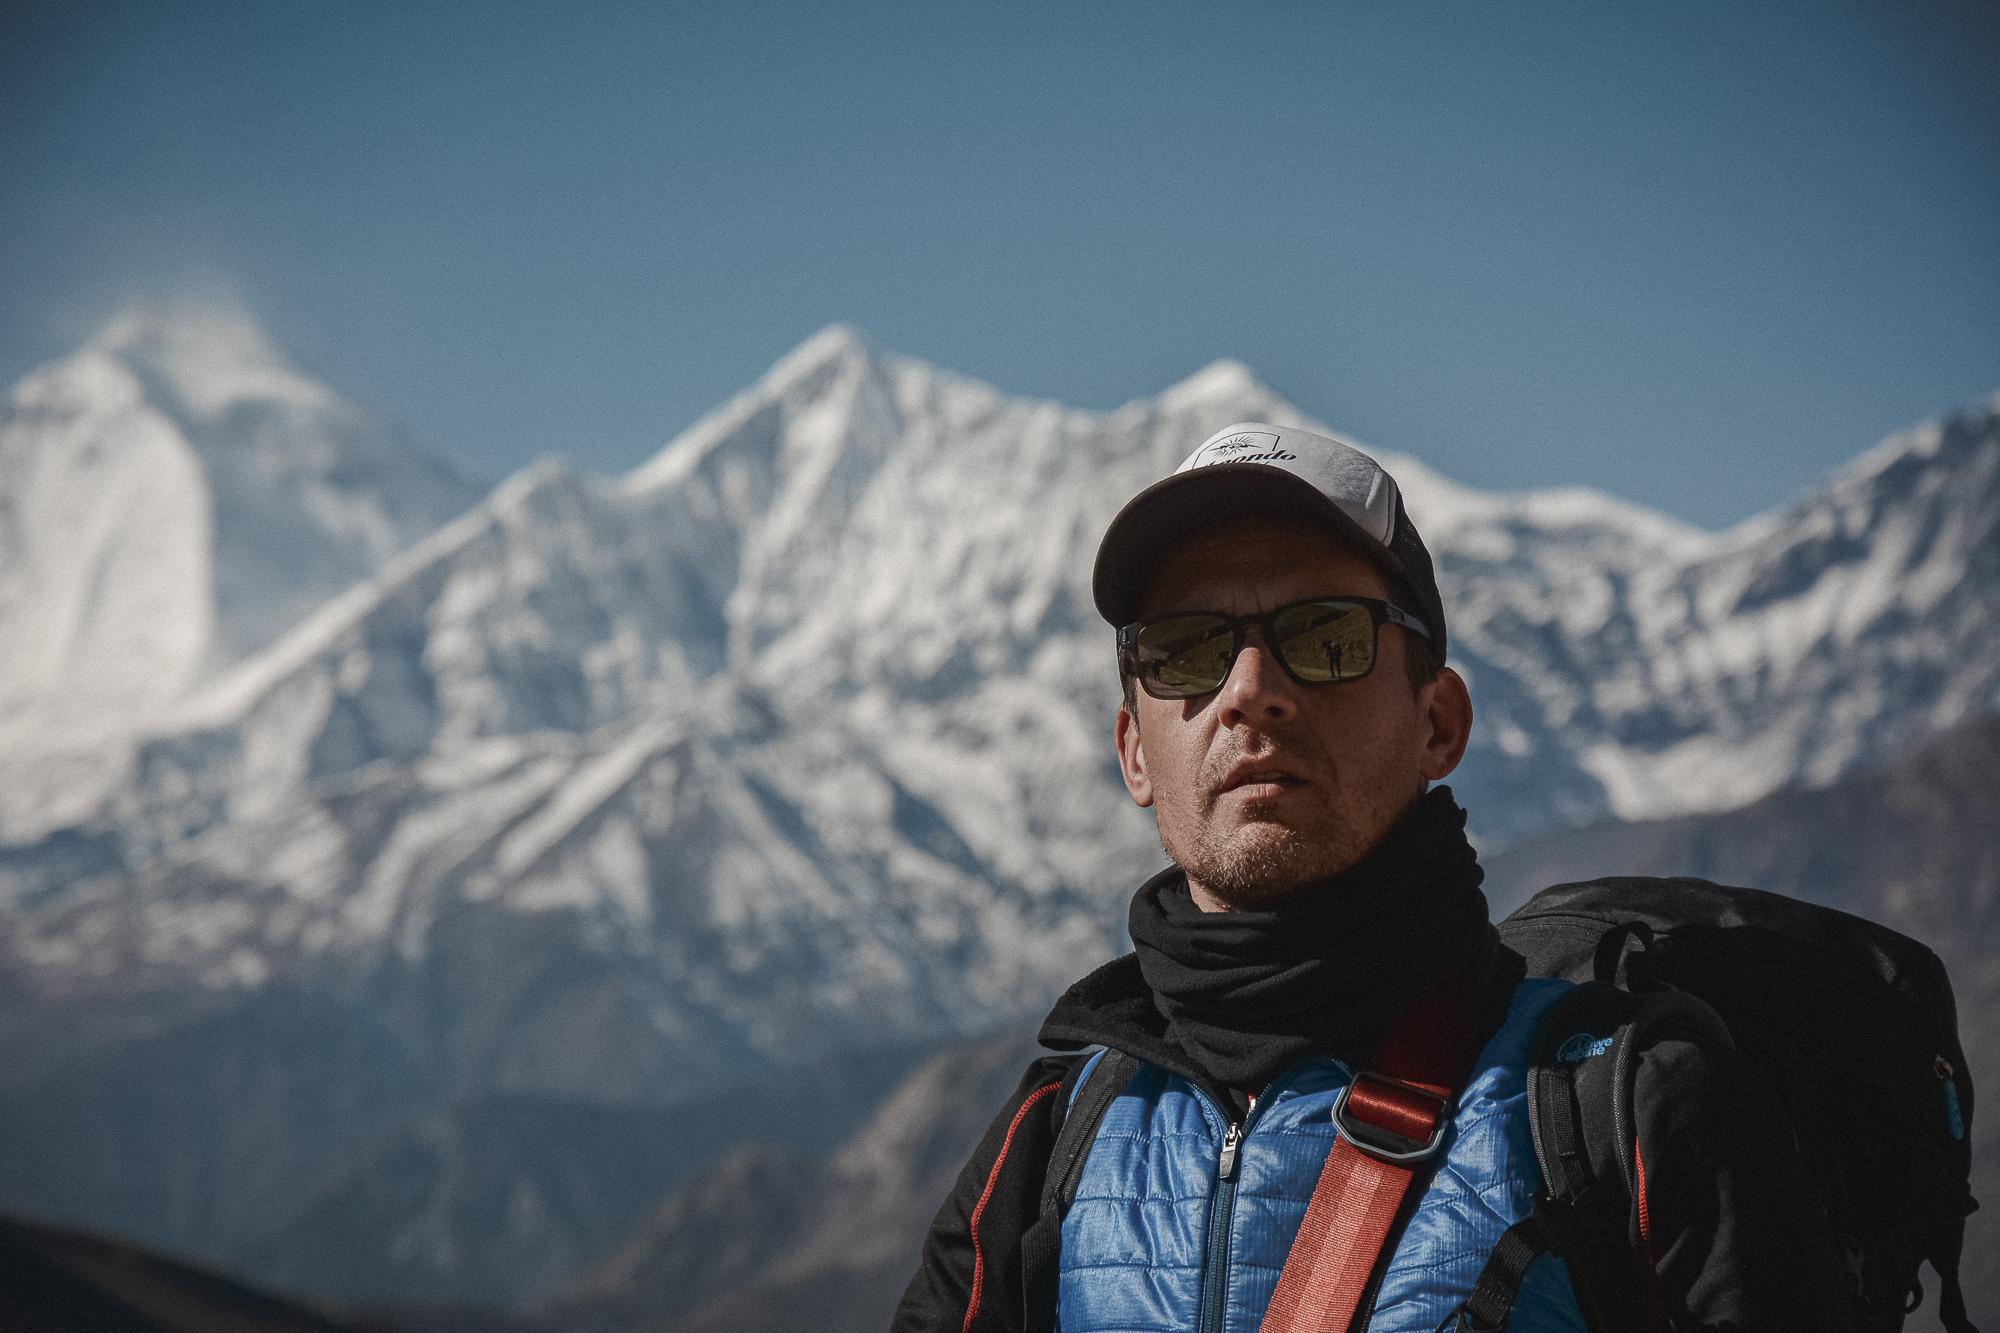 Nepal_Anap_Titelbild_Harry Bellach